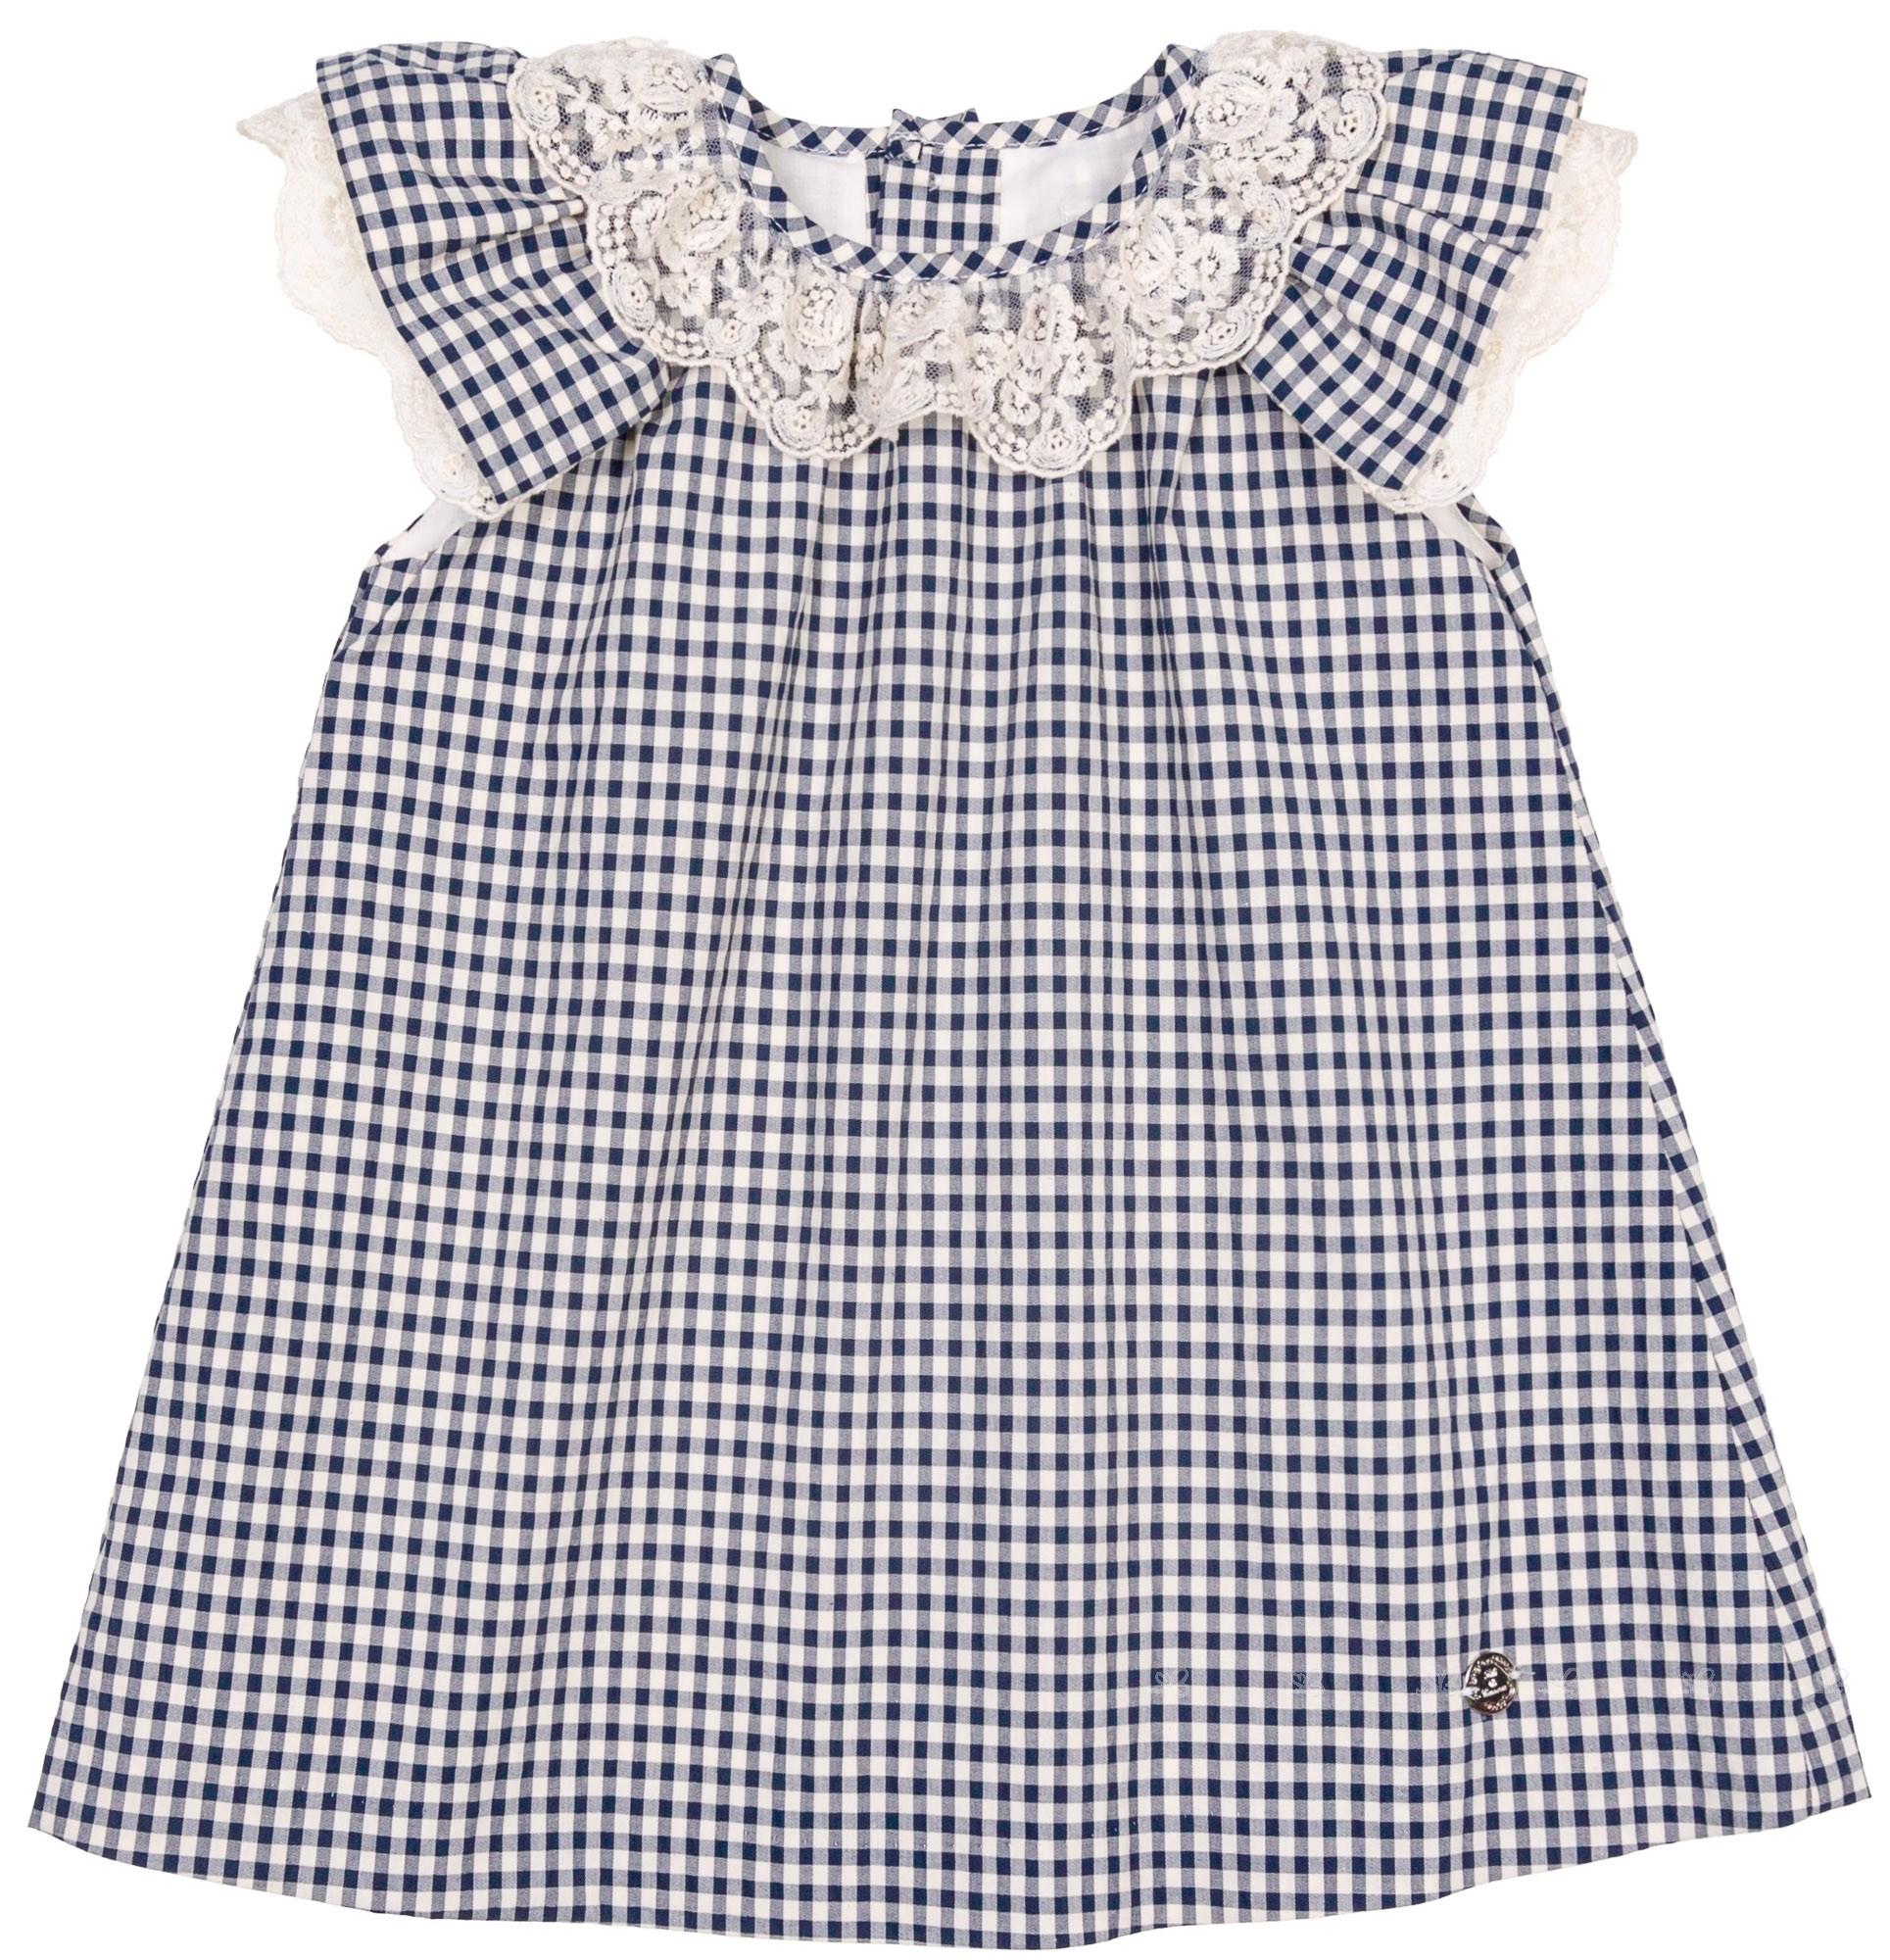 b0d39ed3f Pili Carrera Baby Girls Navy Blue Gingham Dress Set   Missbaby